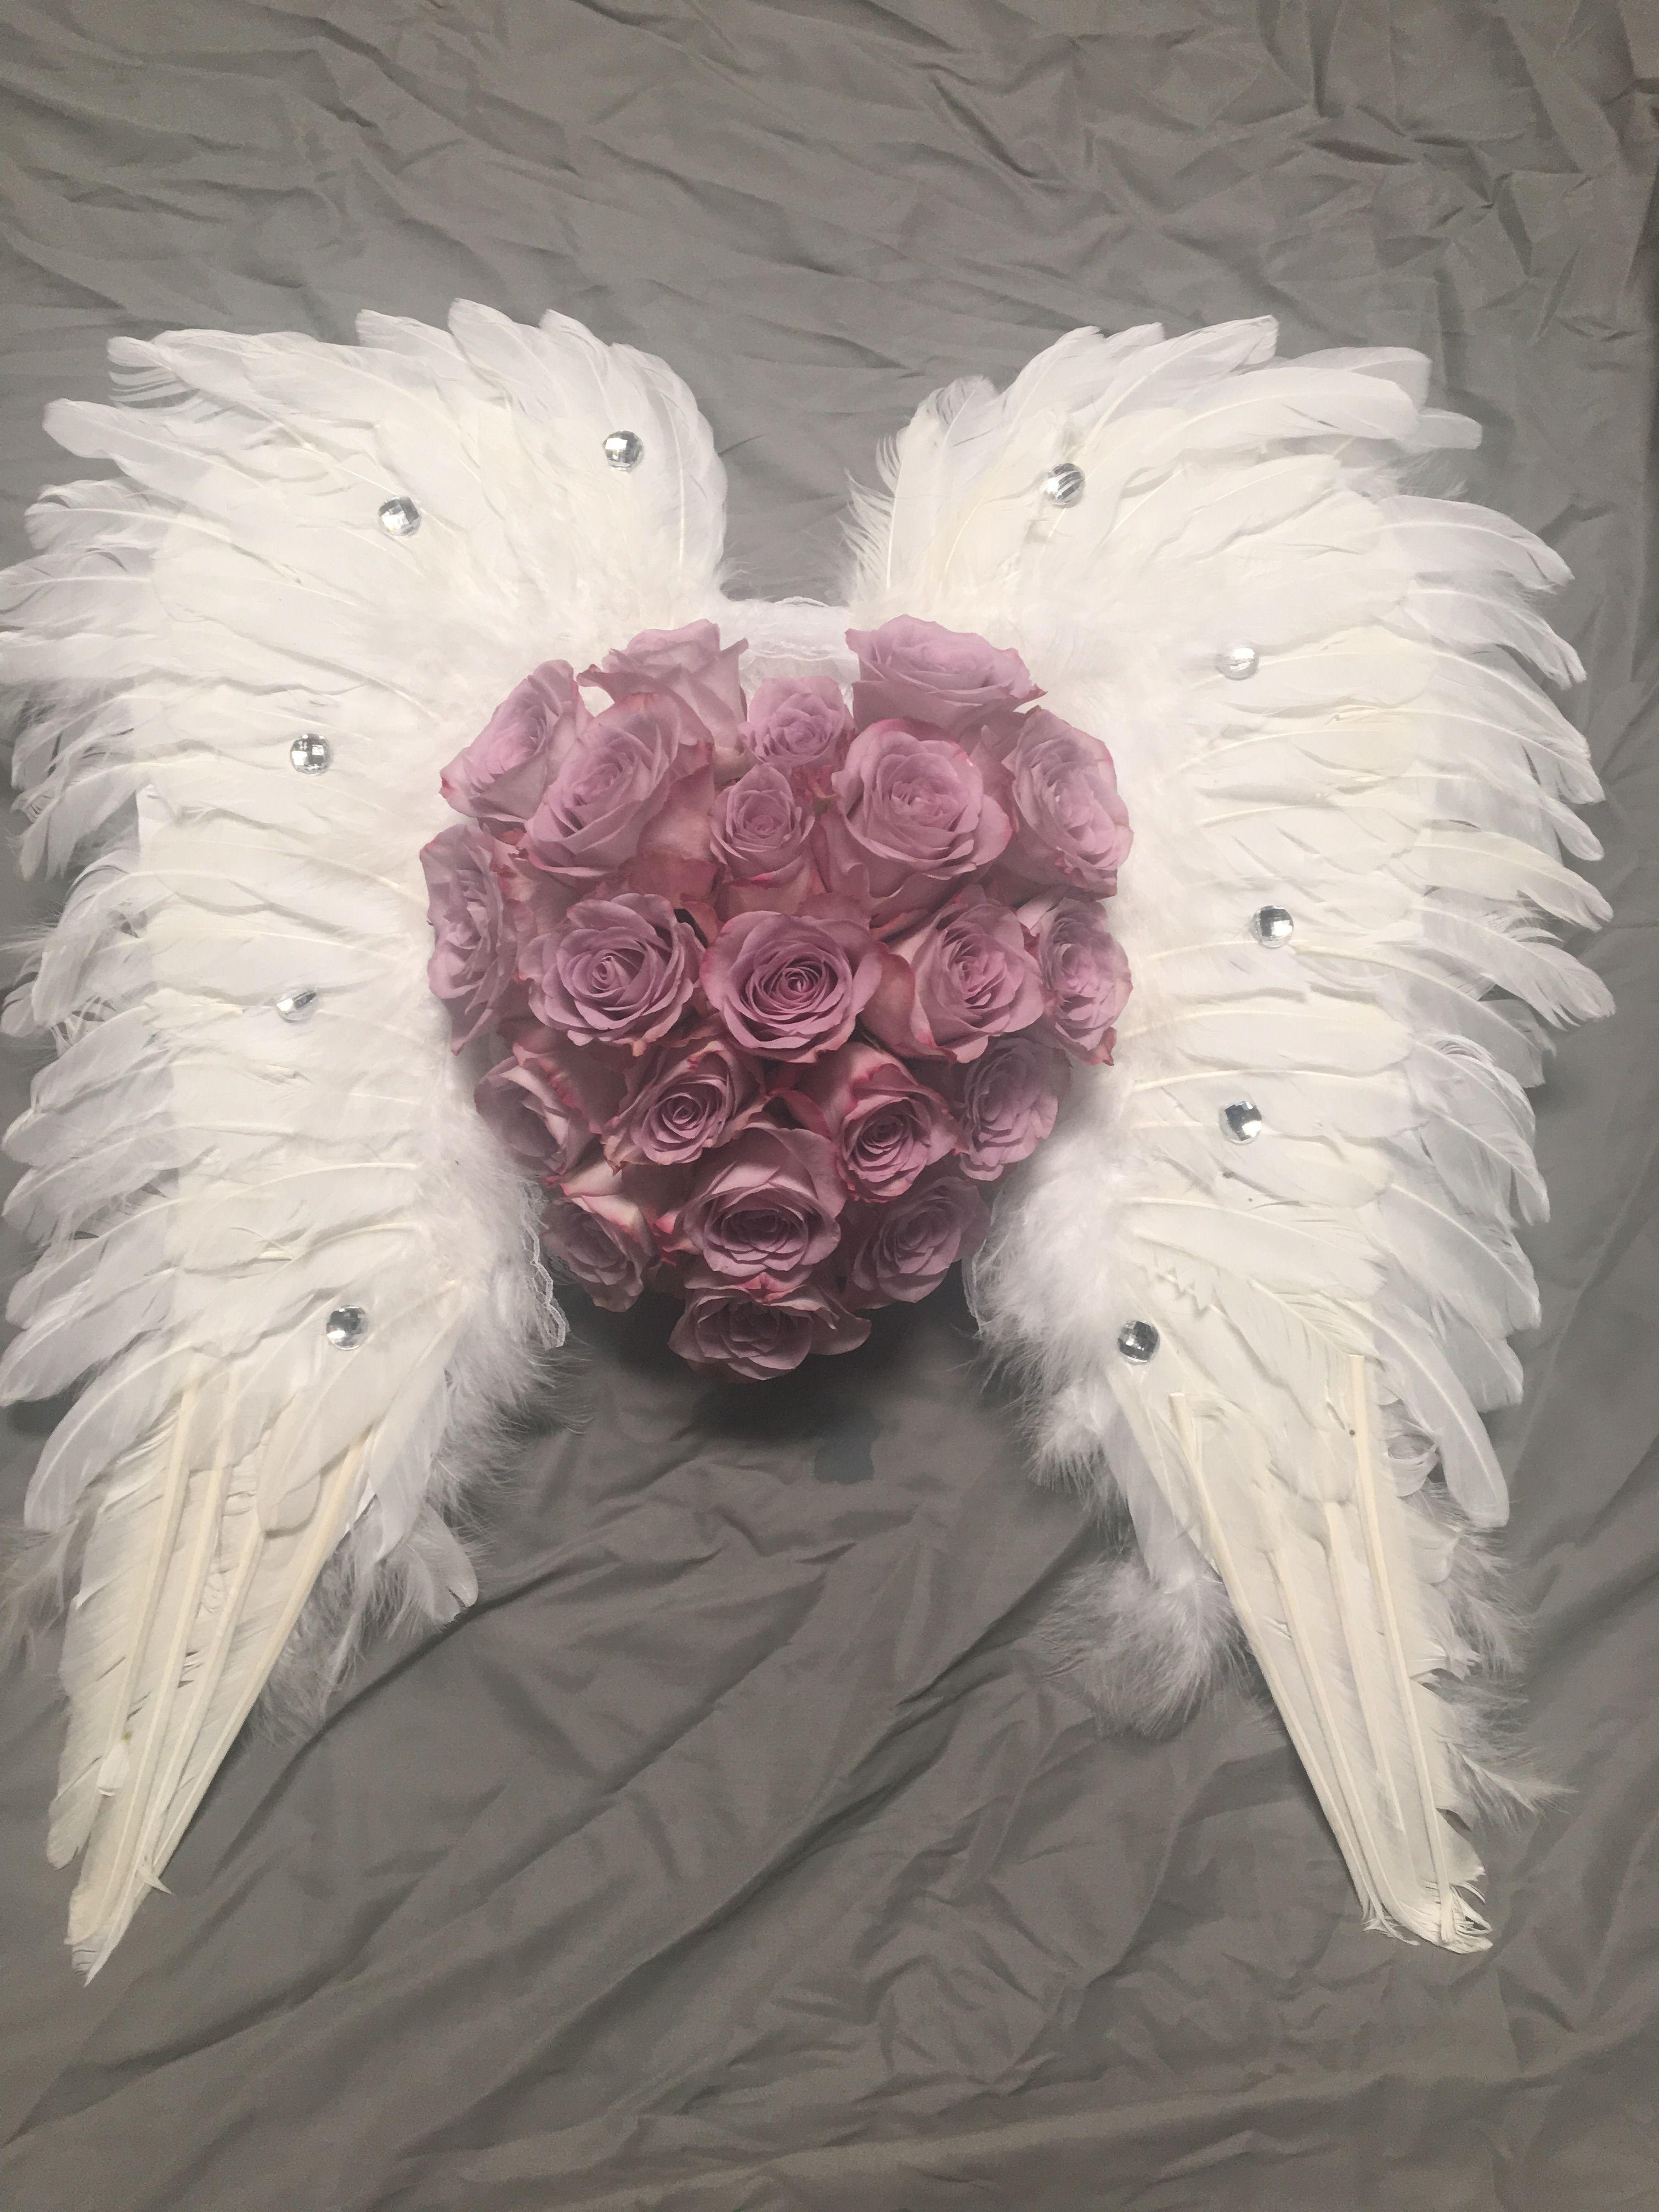 Angel wings funeral flowers abi pinterest funeral flowers angel wings funeral flowers izmirmasajfo